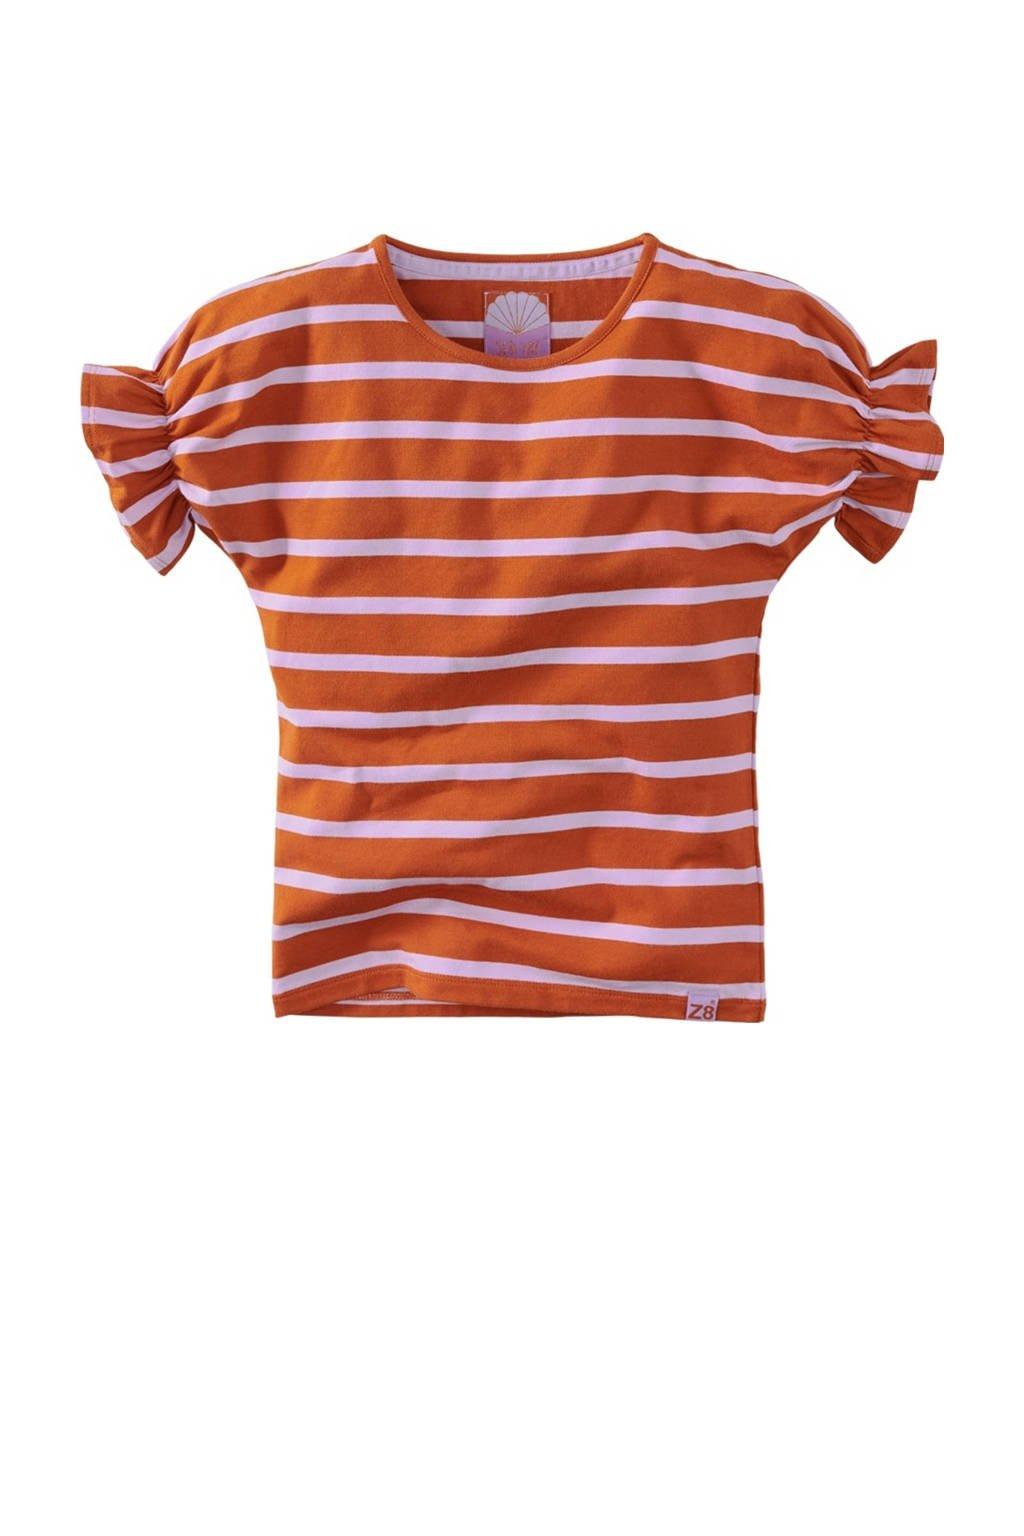 Z8 gestreept T-shirt Jelly roestbruin/lila, Roestbruin/lila